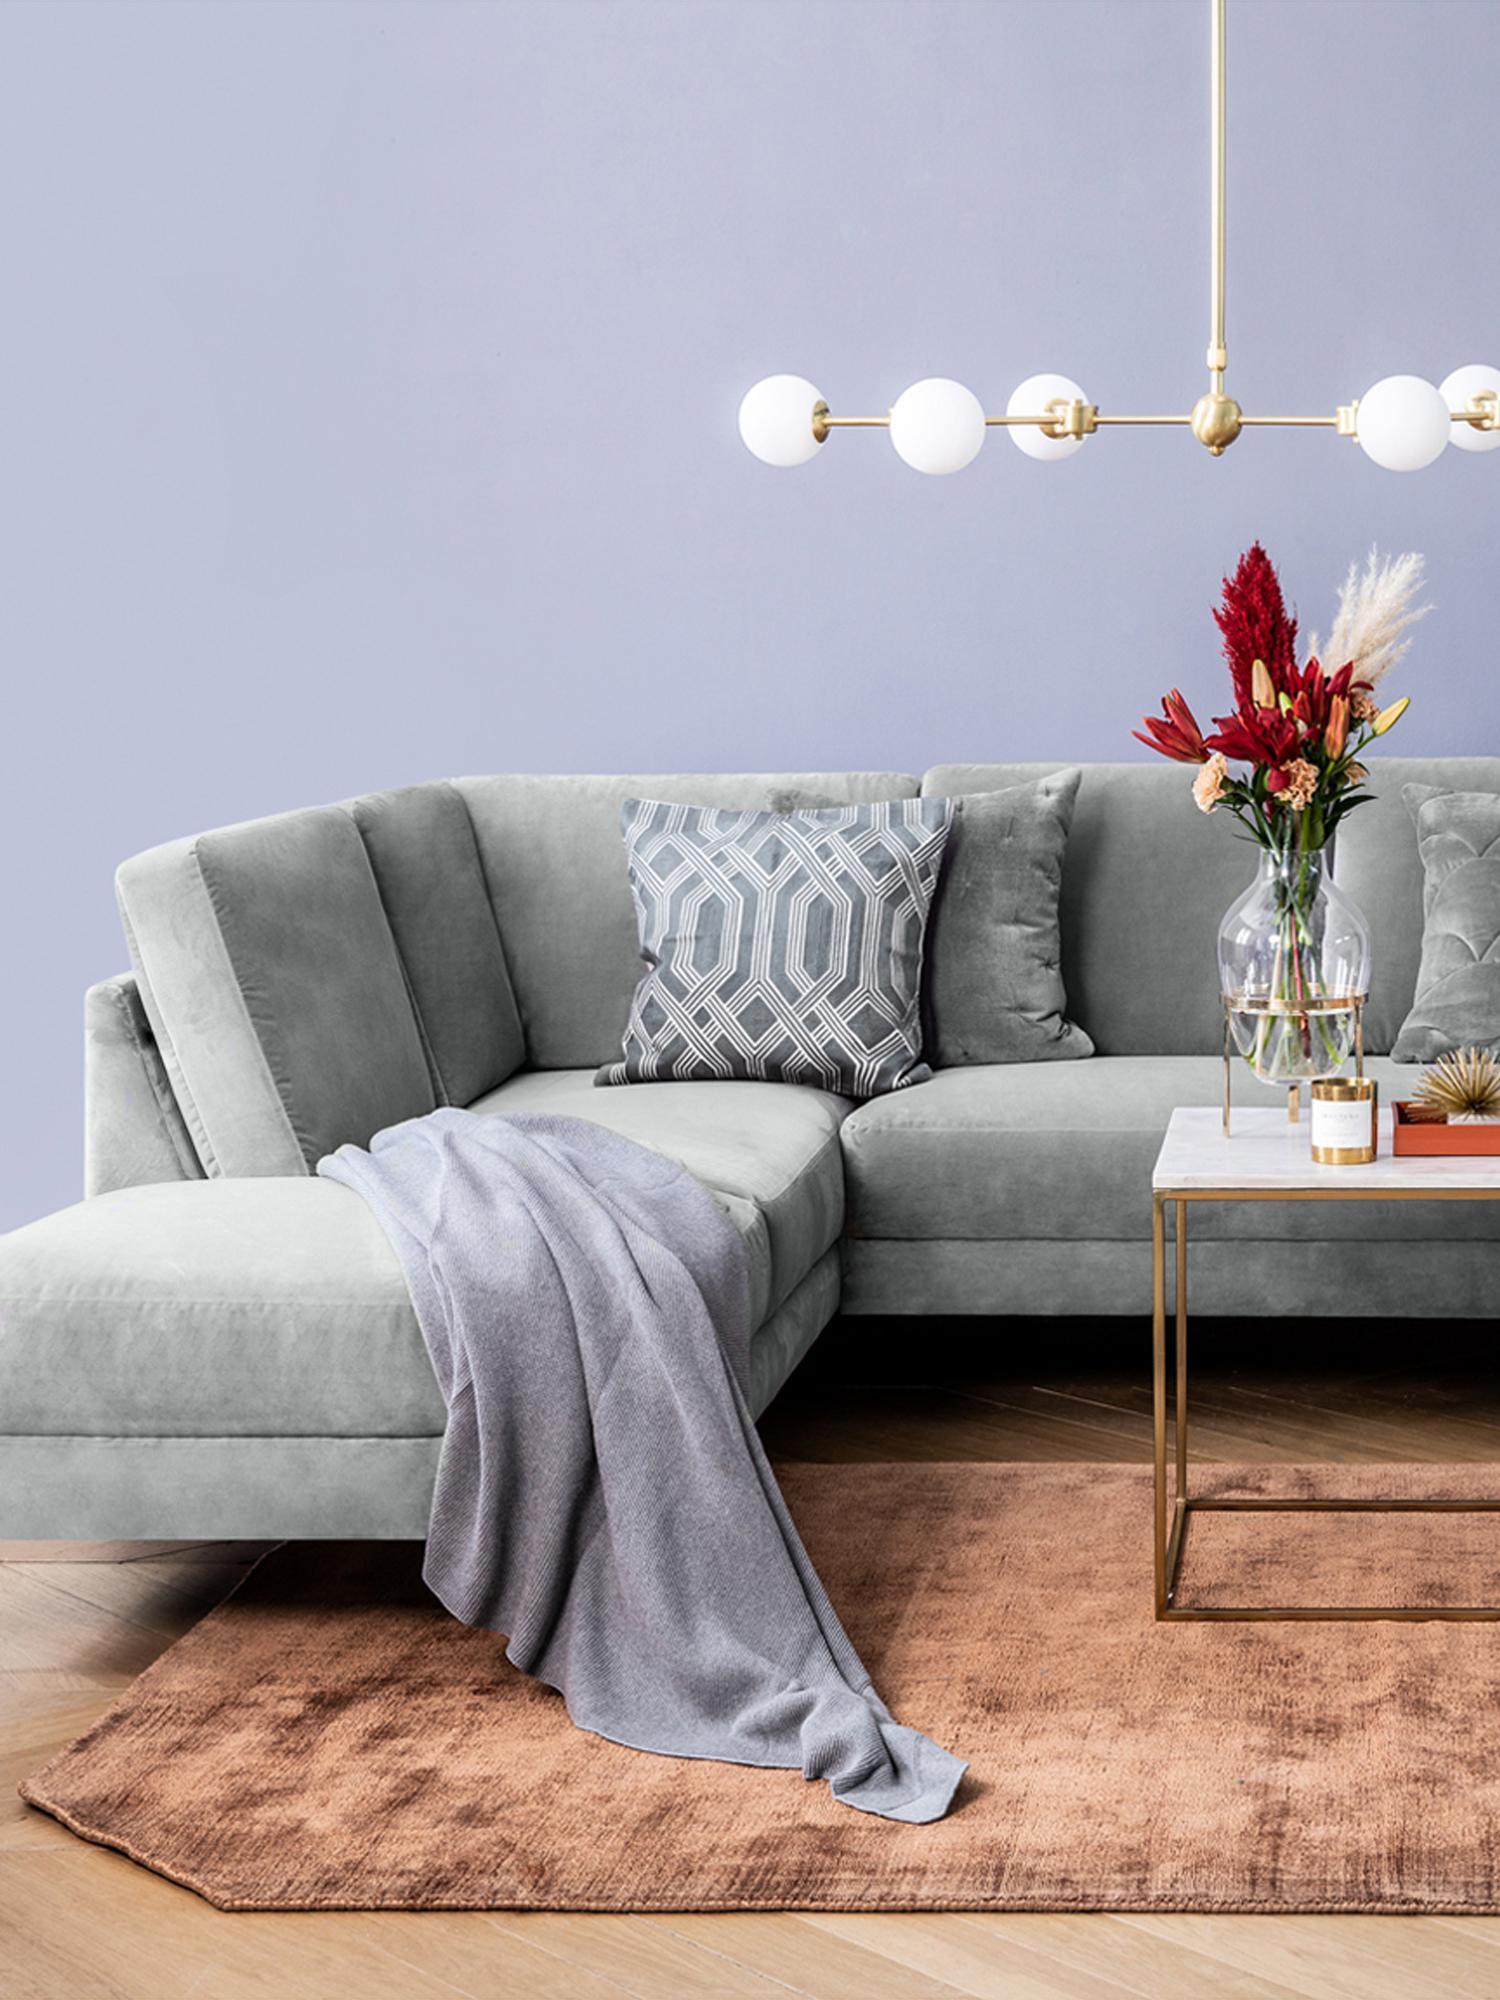 Handgewebter Viskoseteppich Jane Diamond in Terrakotta, Flor: 100% Viskose, Terrakotta, B 160 x L 230 cm (Größe M)